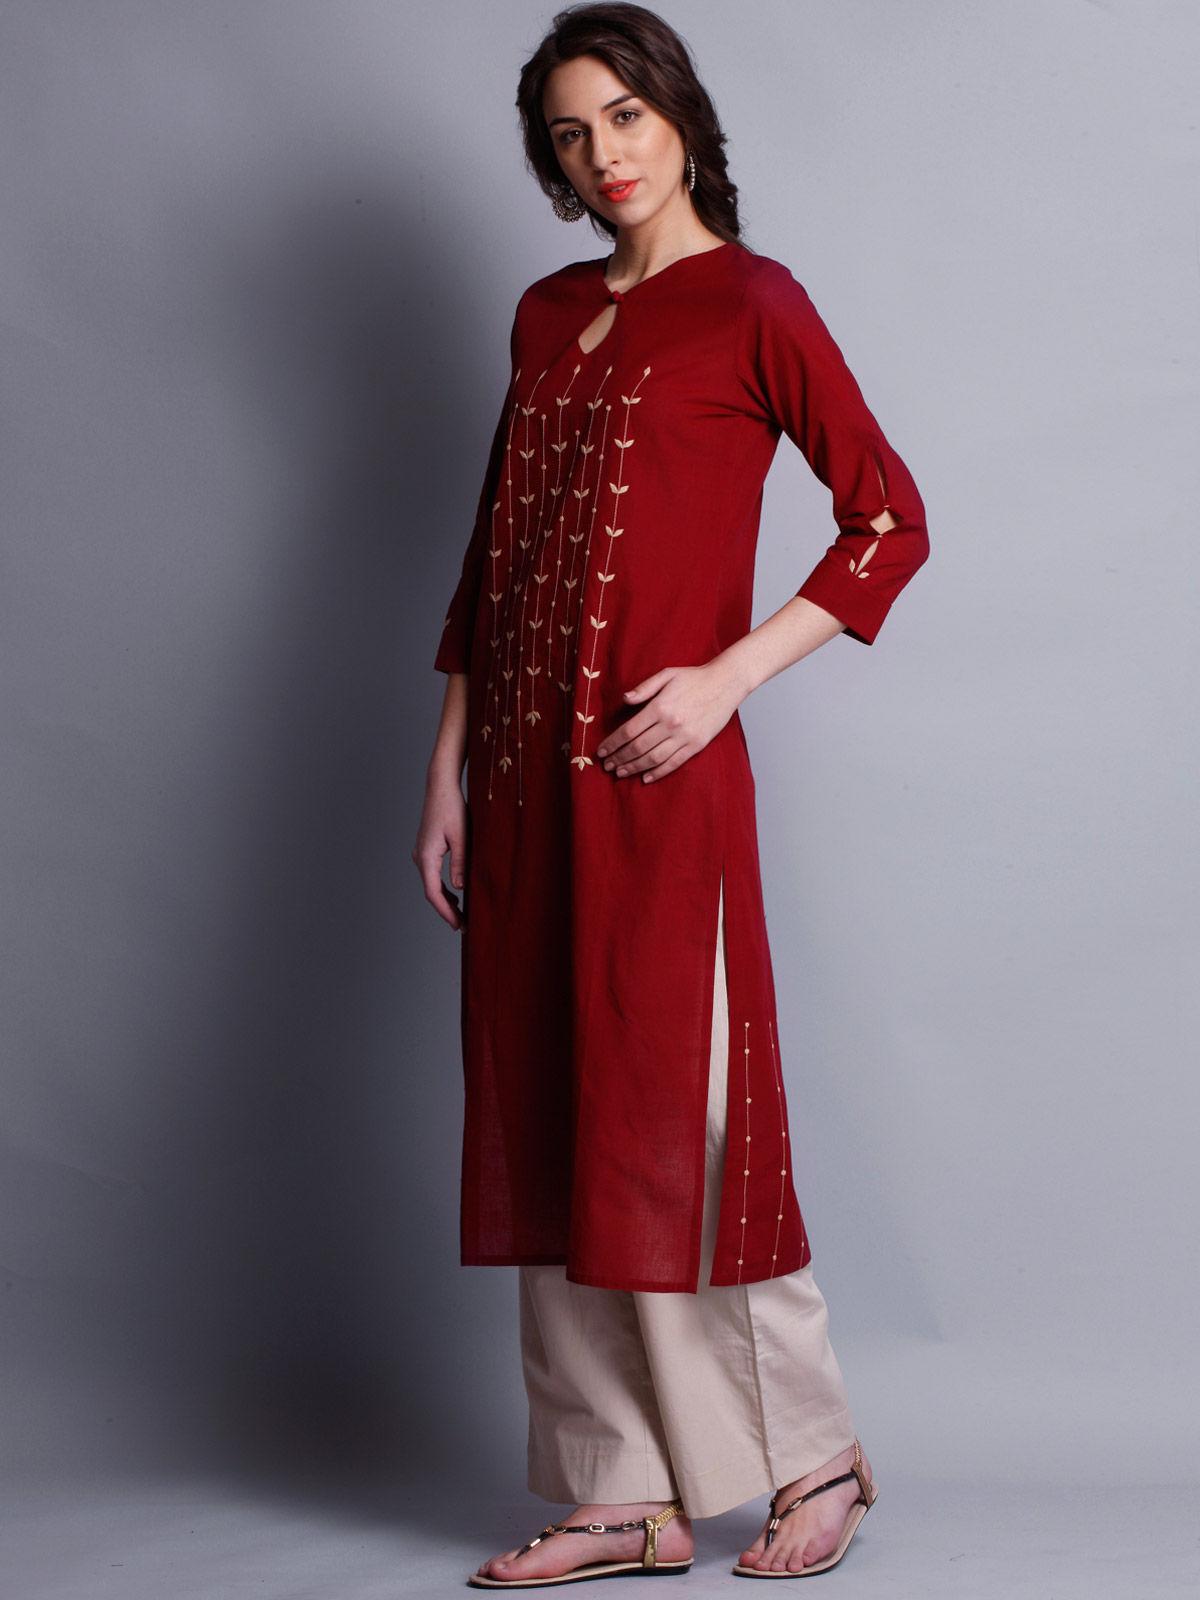 Patti work embroidered red long kurta